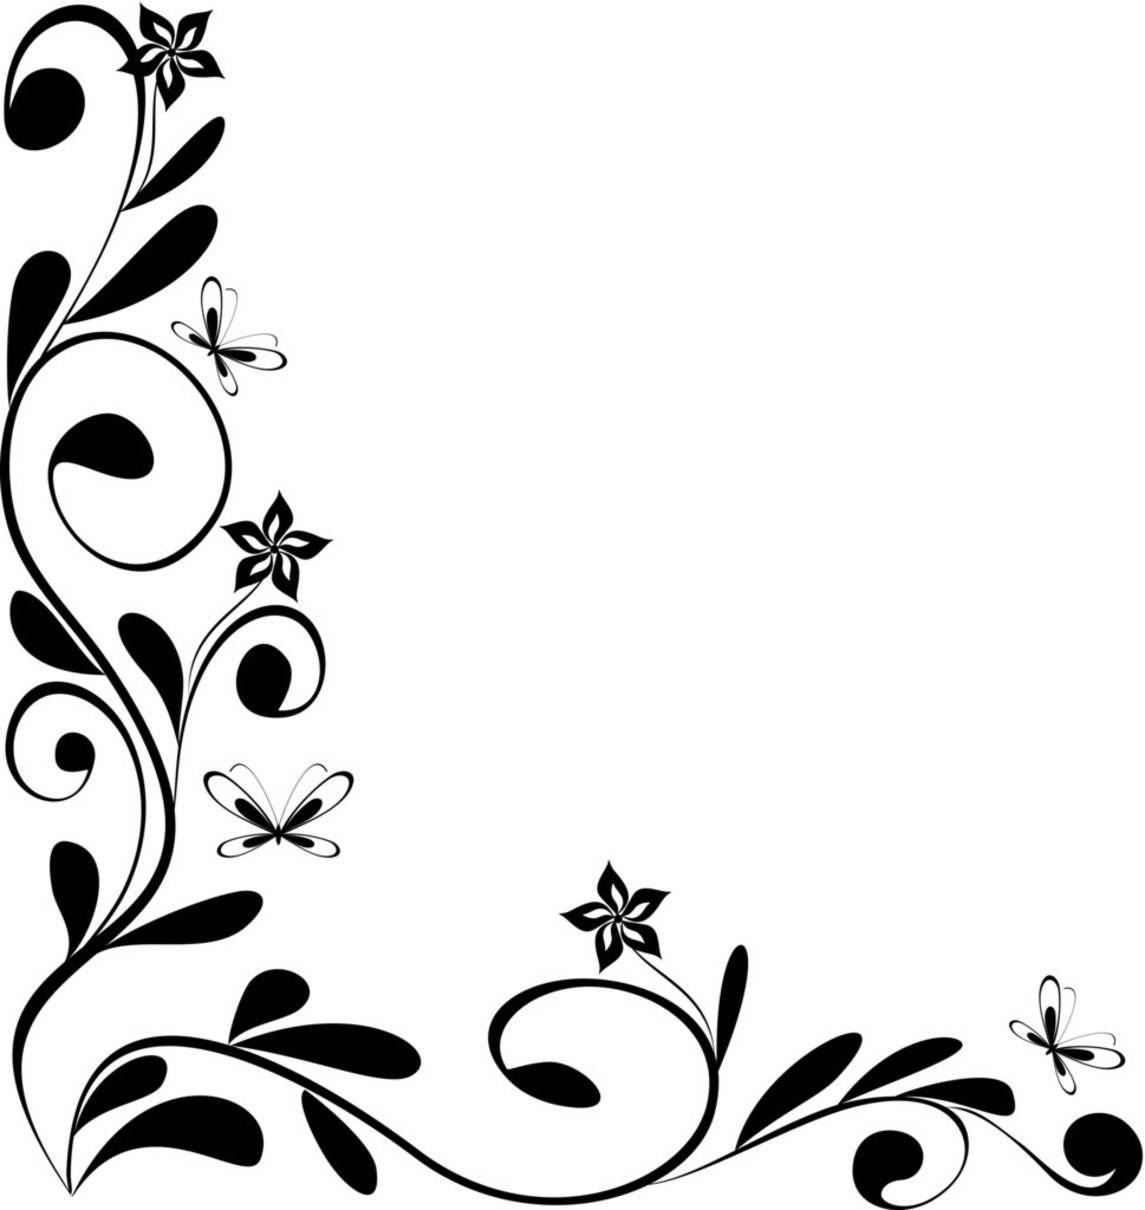 Black And White Floral Border Design Silhouette Pinterest